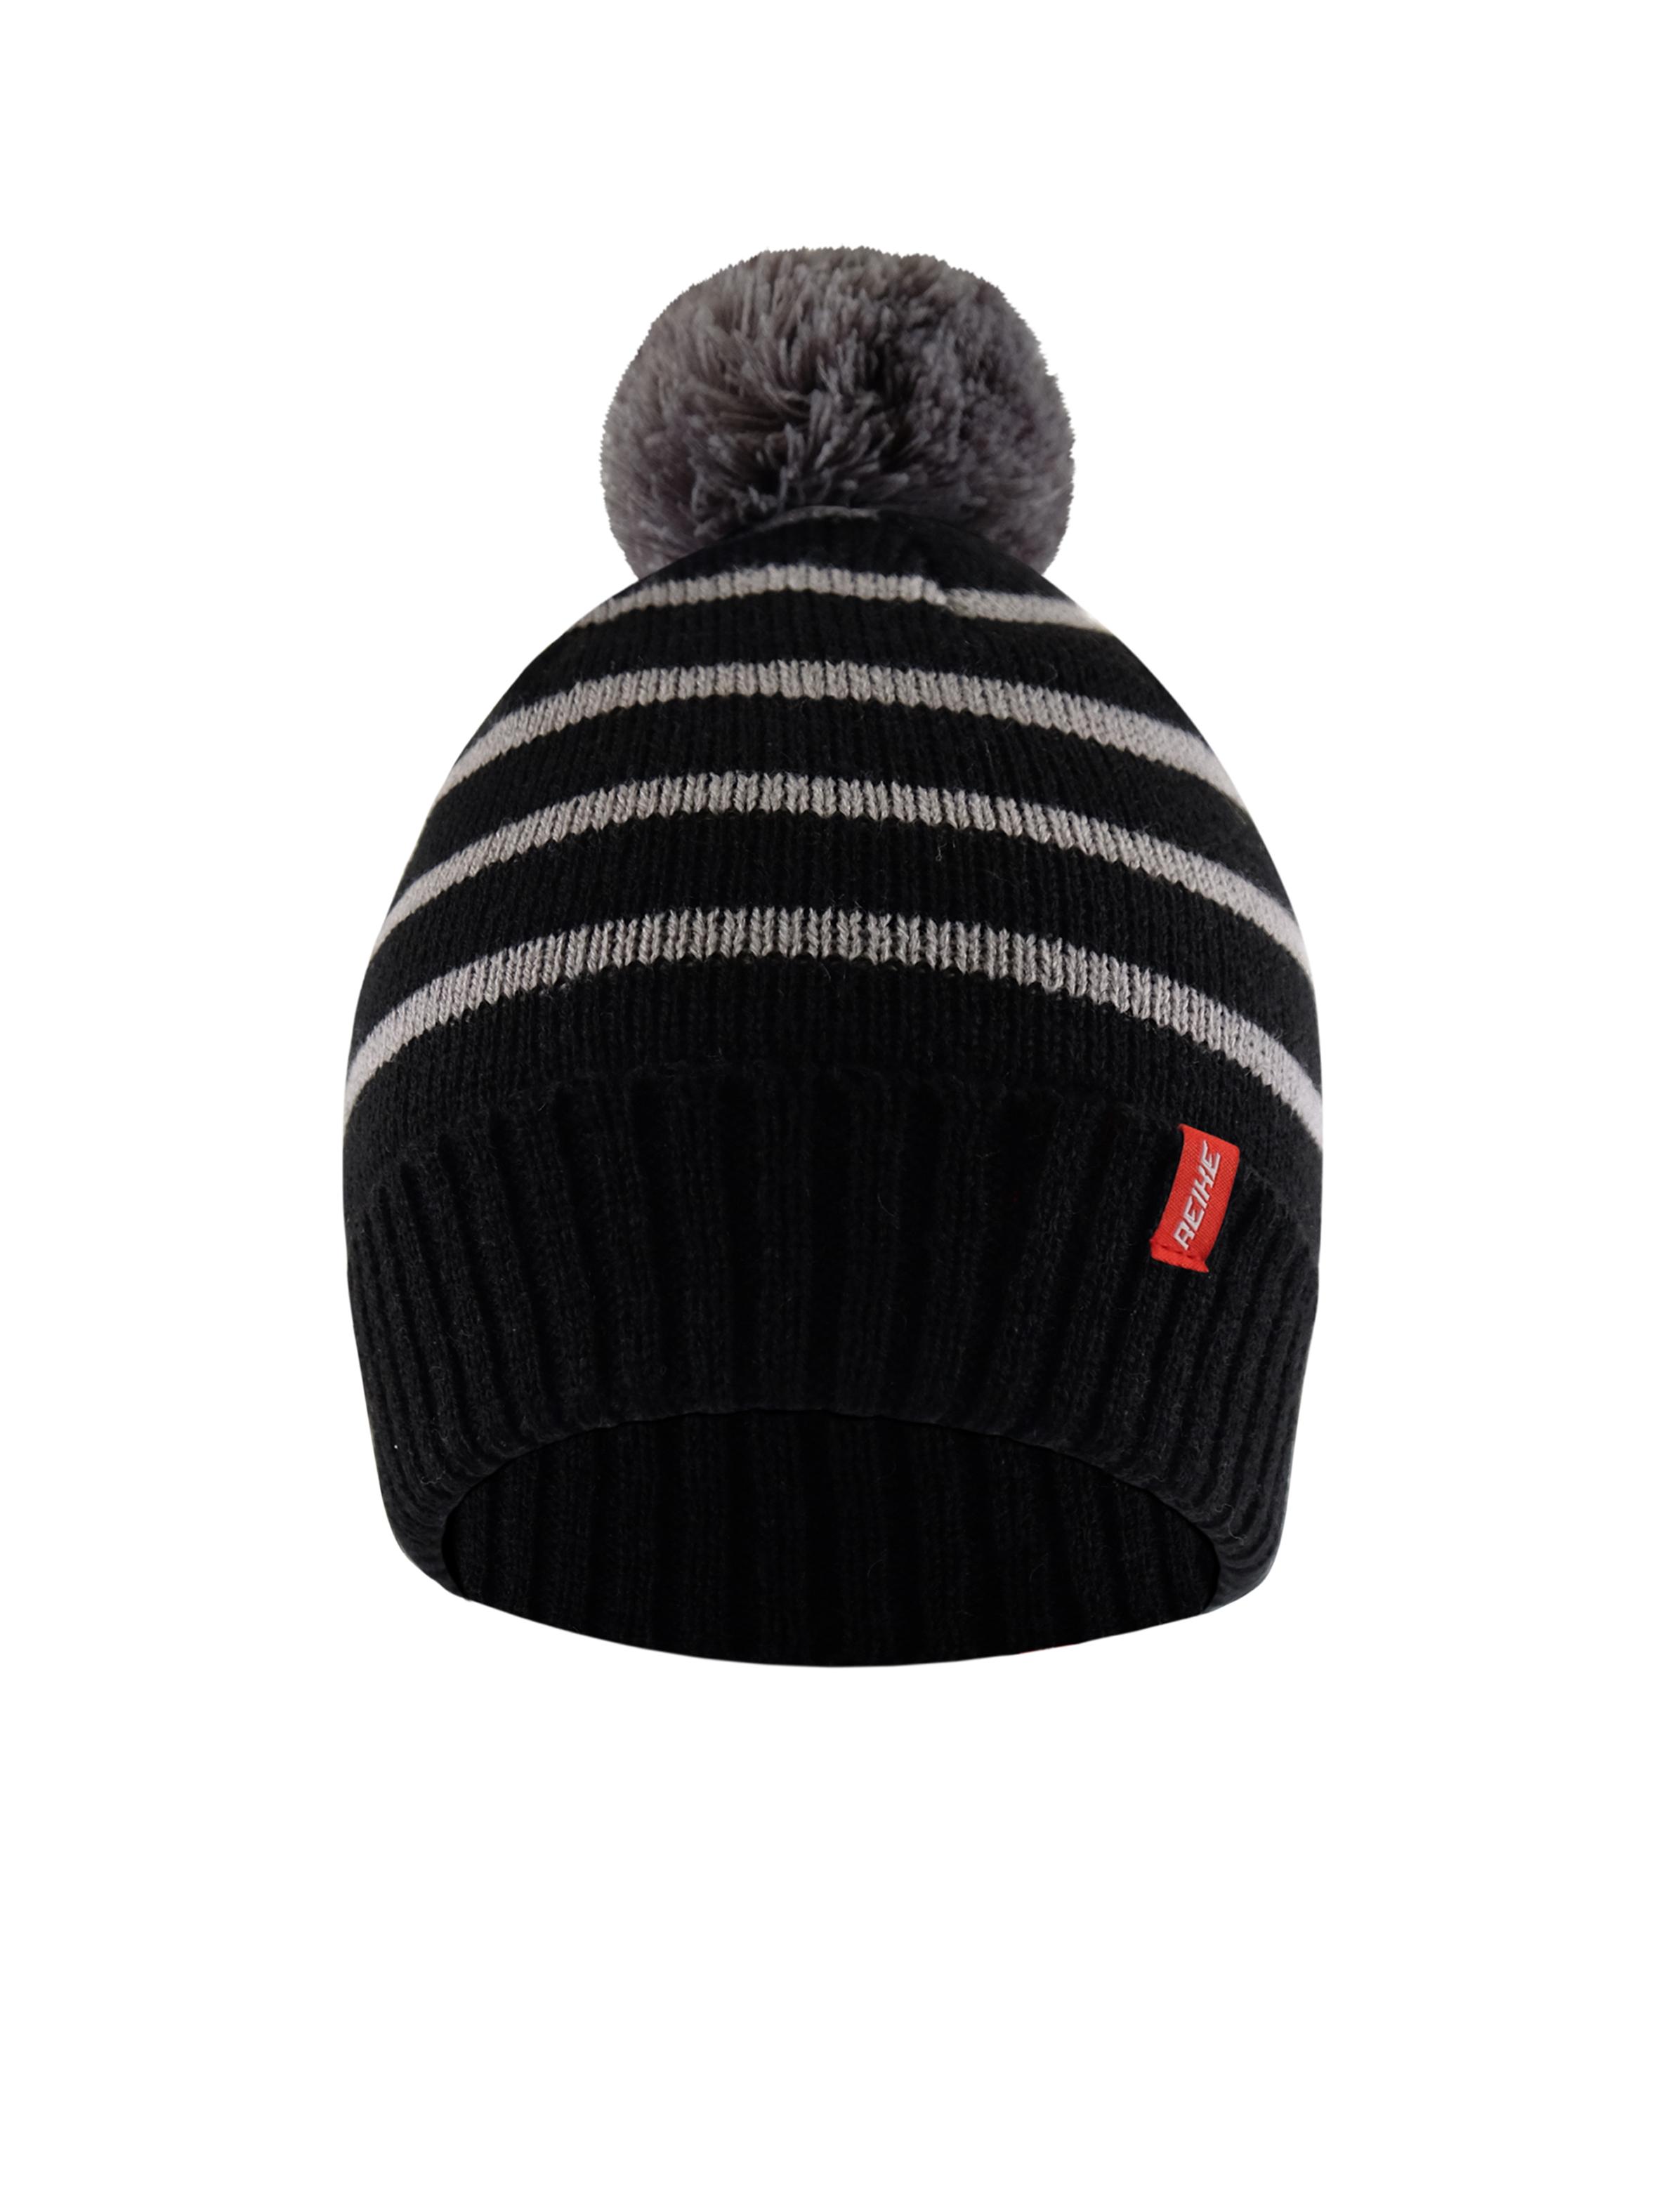 Купить Шапка для мальчика Reike GEO black, RKN2021-2 GEO black, р.54,